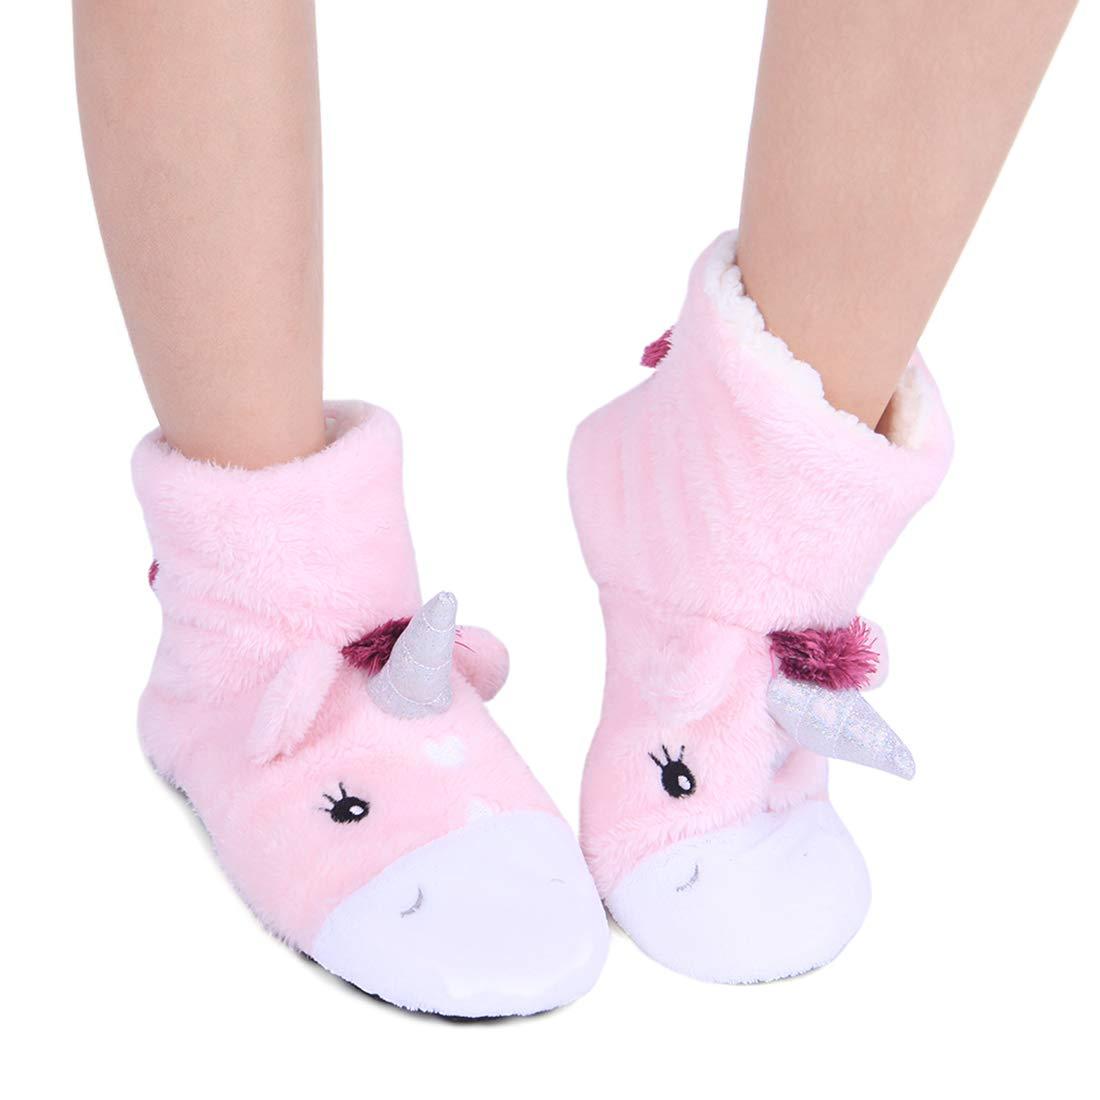 ChicNChic Women Cute Cartoon Unicorn Slipper Socks Non-Slip Bootie Slipper Socks Lightweight Indoor Slippers Christmas Gift (6-6.5 B(M) US, Pink)